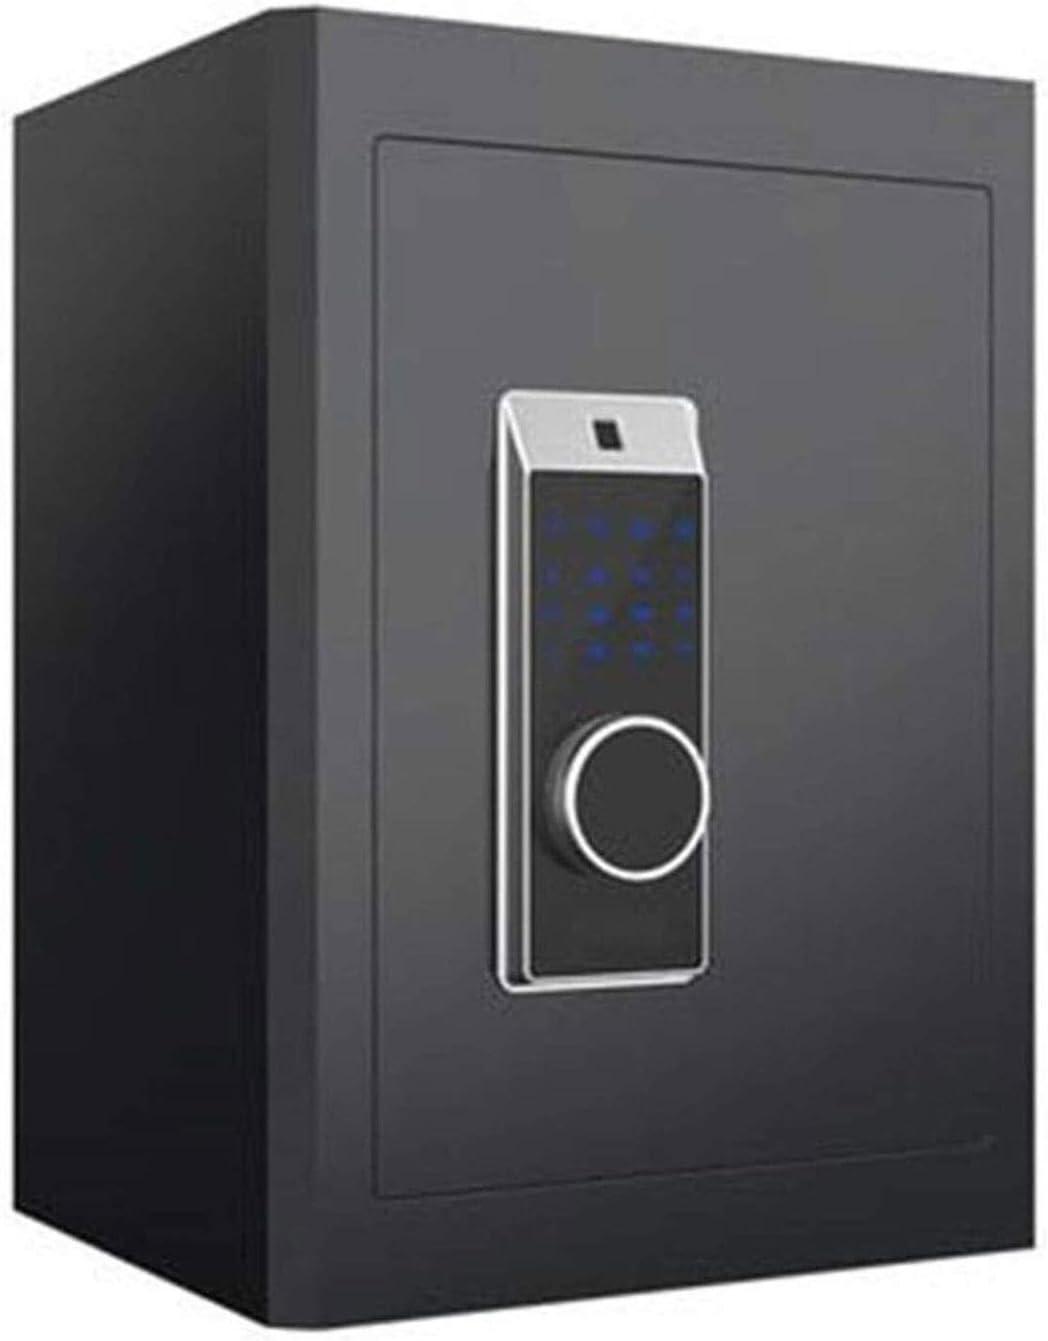 DJDLLZY Cabinet Safes Security Lock Unlocking Boxes High 45 Max Super sale 85% OFF Safe